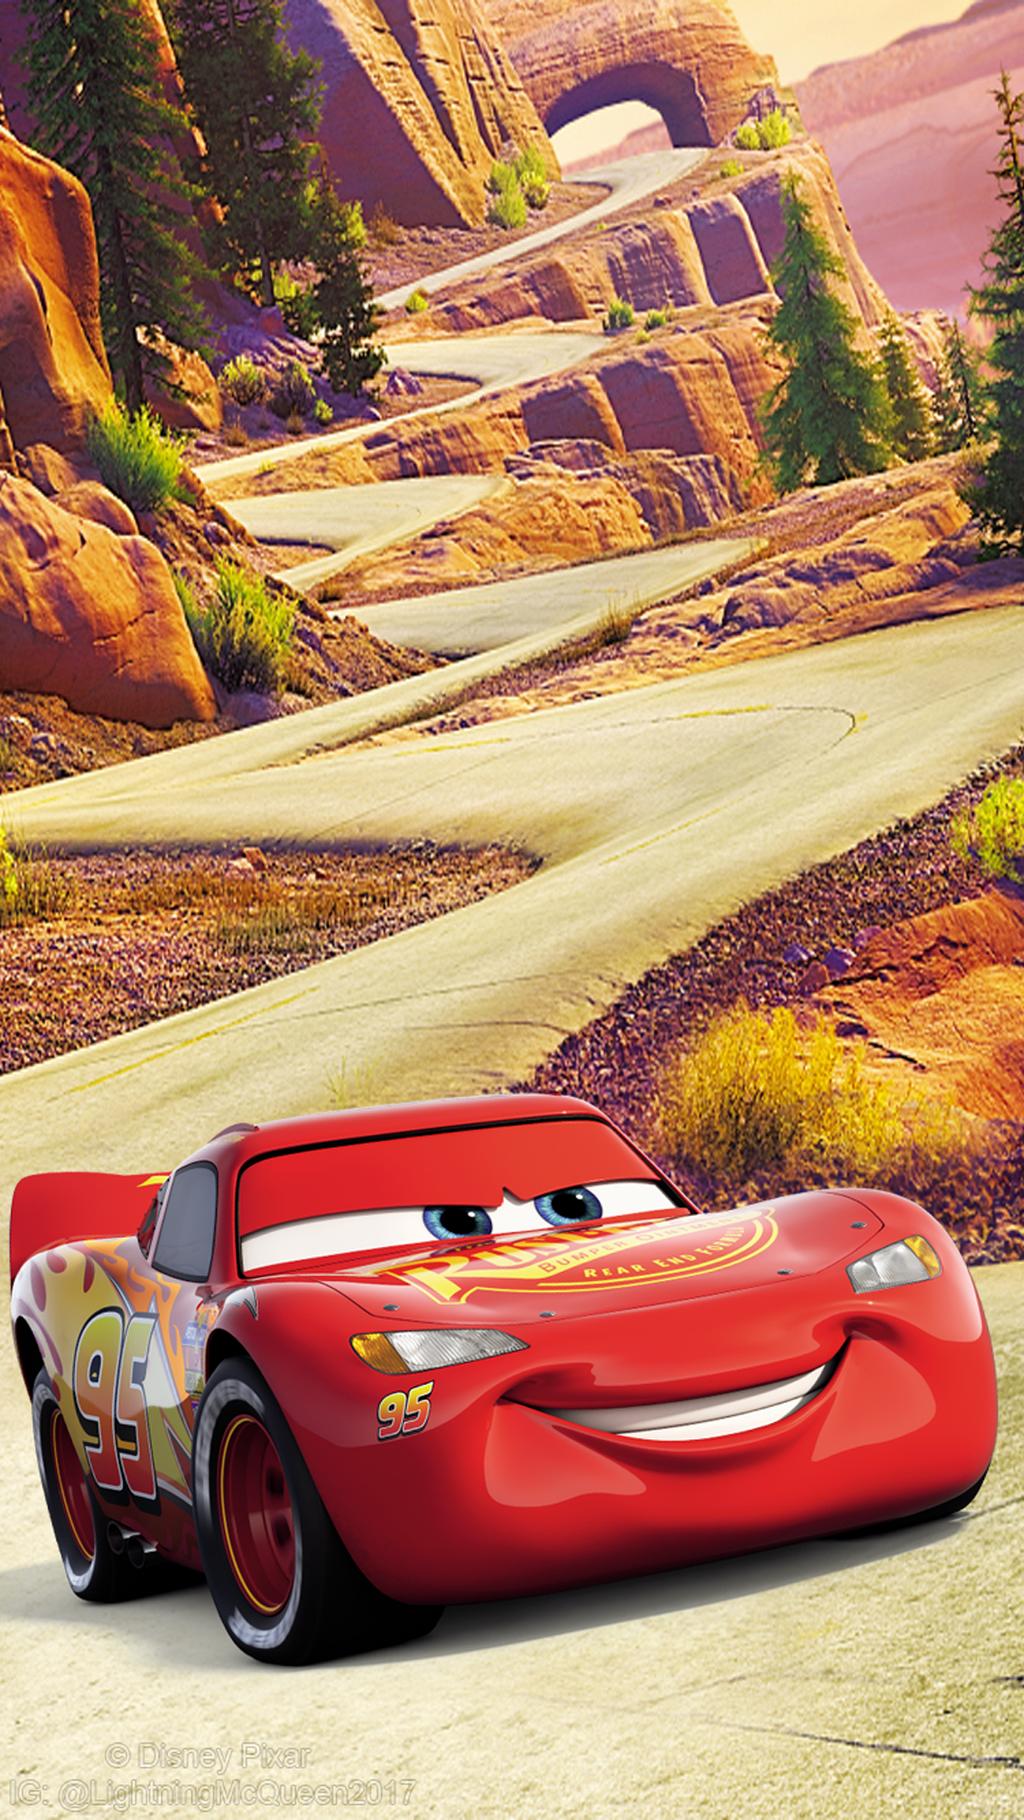 Cars 3 lightning mcqueen wallpaper 1080x1920 by - Disney cars 3 wallpaper ...